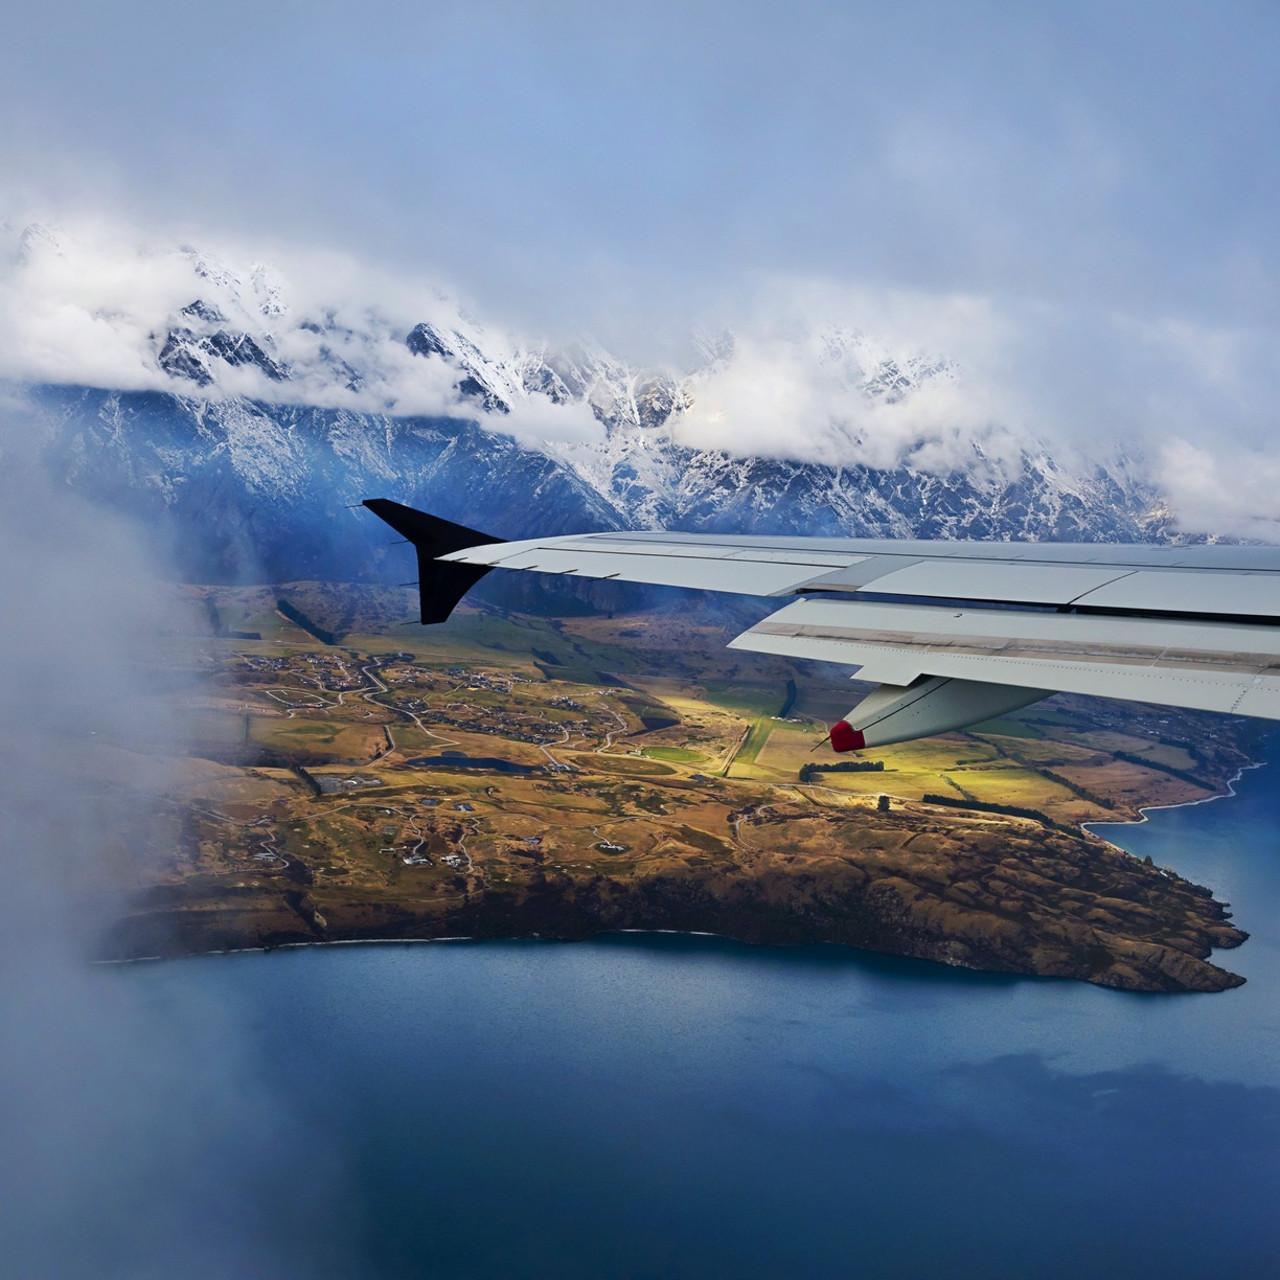 Аэропорт Куинстауна (Новая Зеландия) / Queenstown Airport (New Zealand)